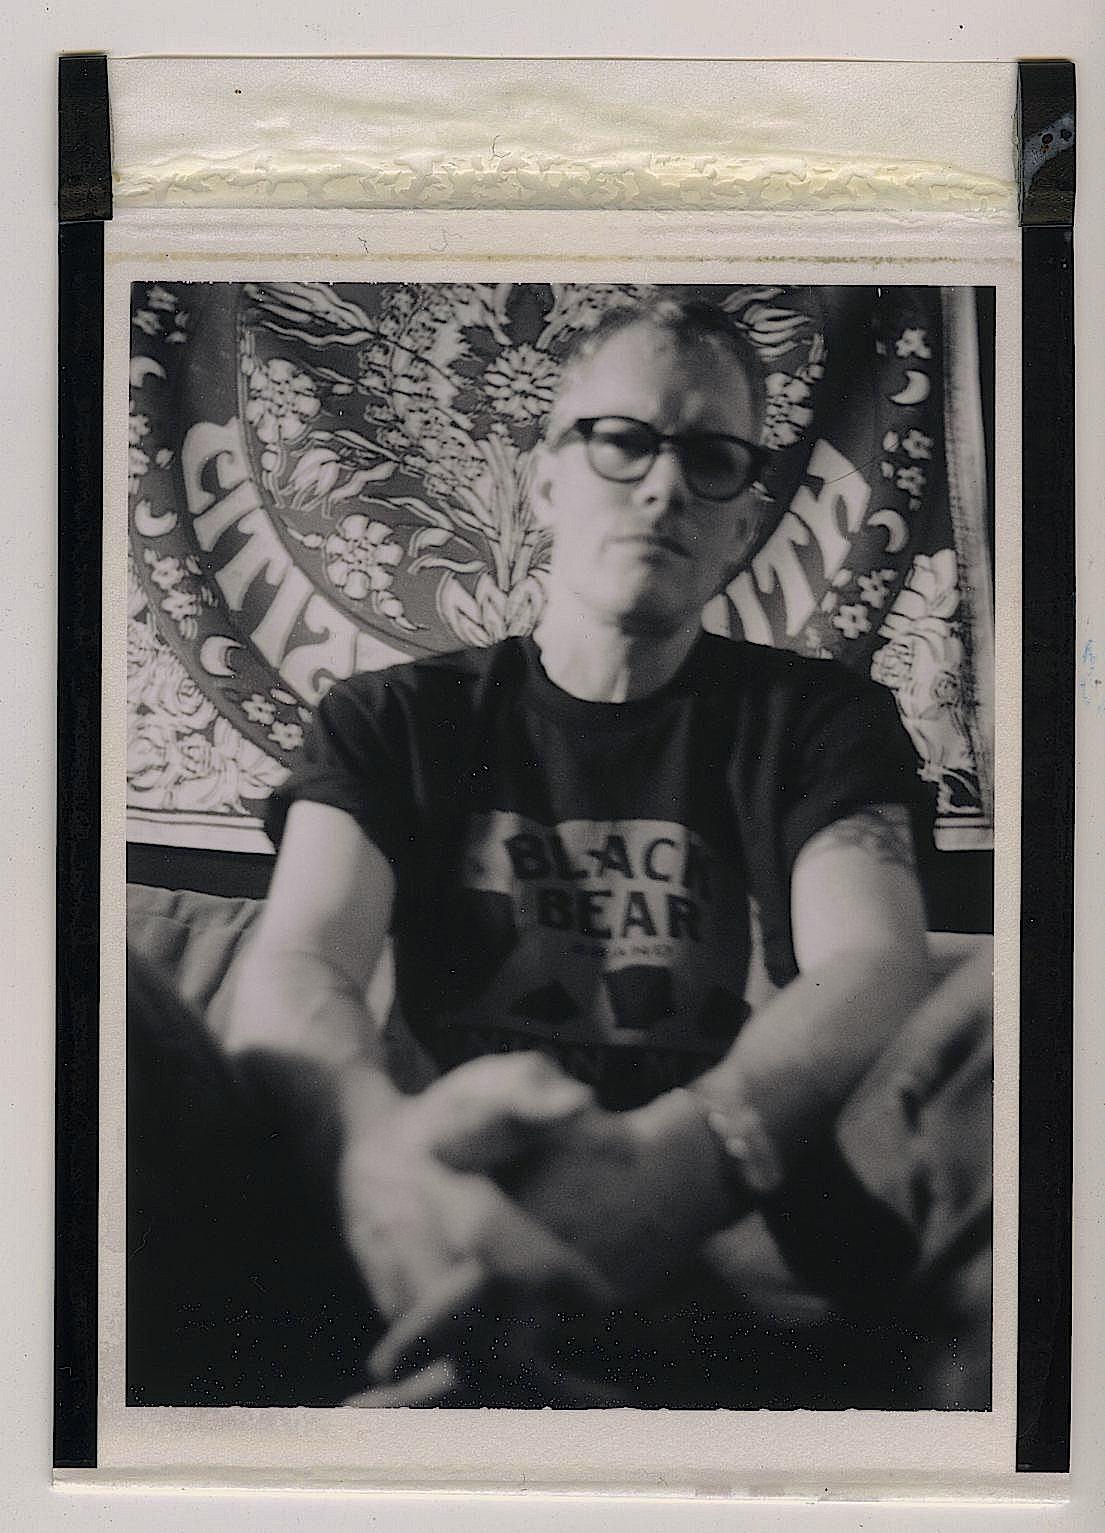 Union-of-Makers-Dave-Krusen-01.jpg